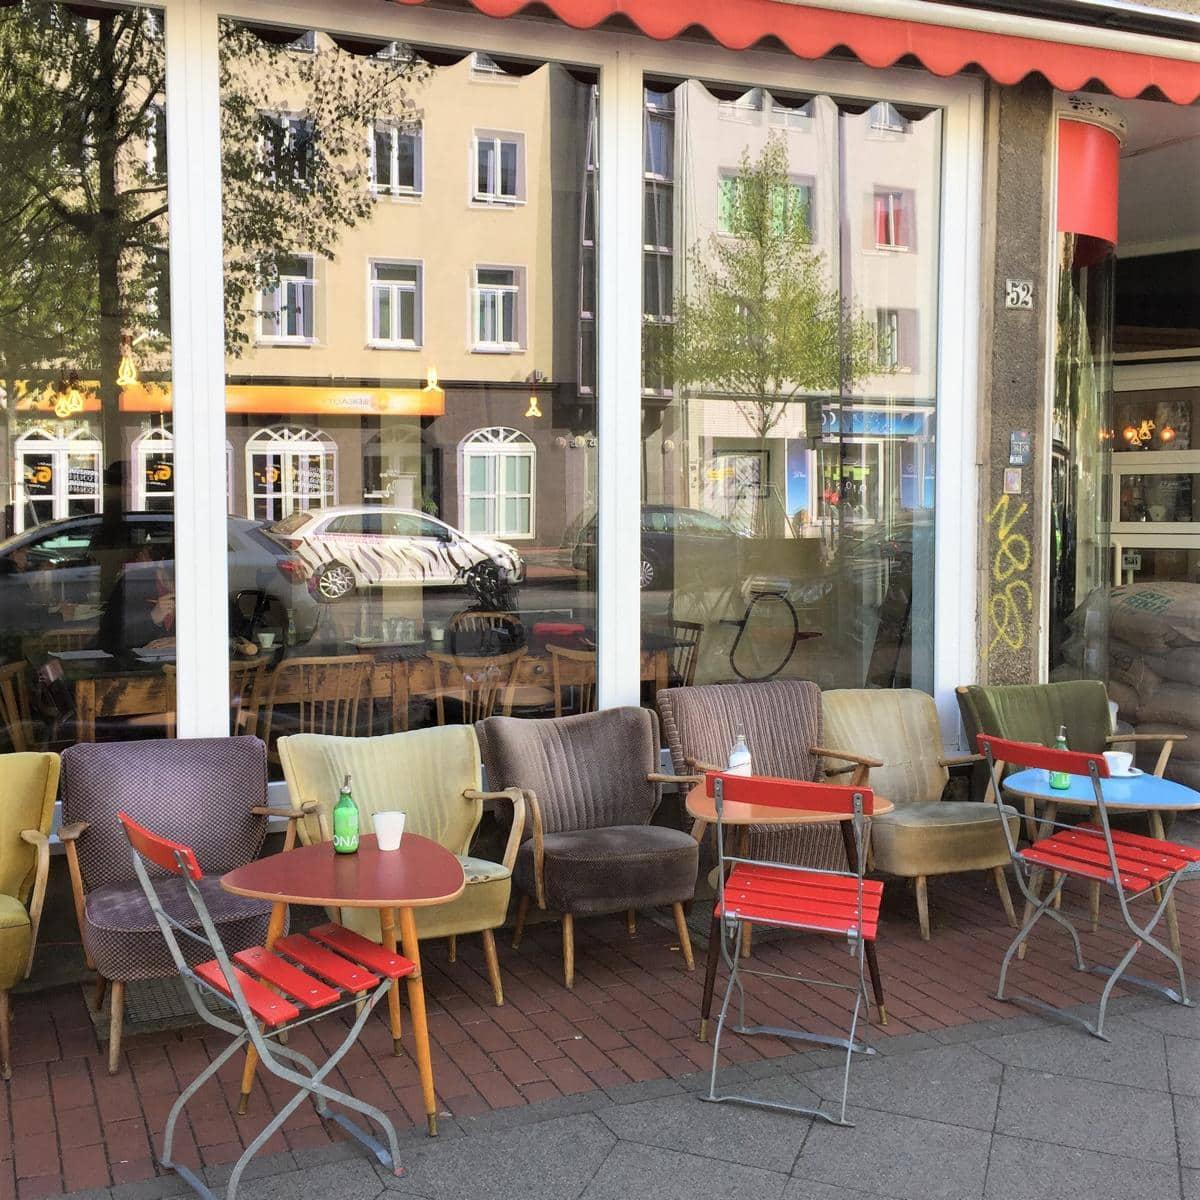 Style Hannover 24Grad Kaffeeroesterei 6 - 24 grad Café & Kaffeerösterei